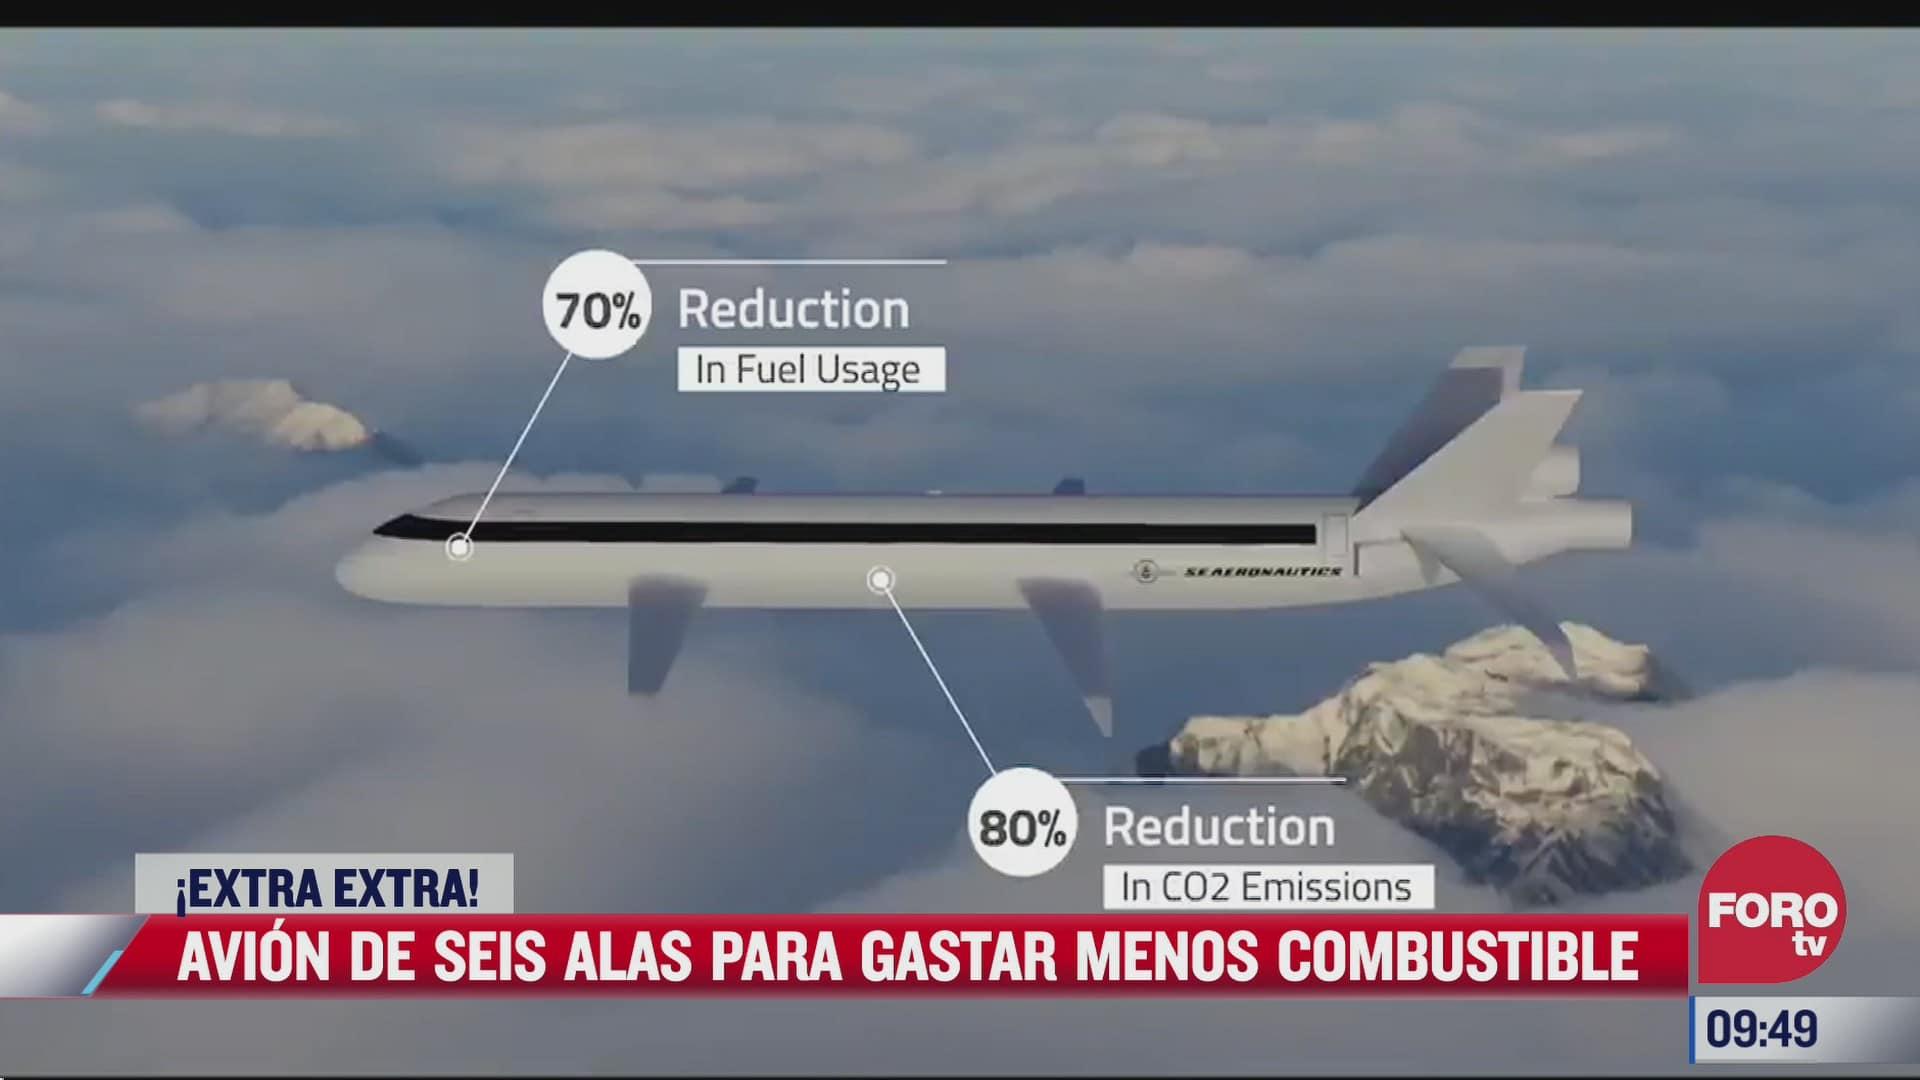 extra extra avion de seis alas para gastar menos combustible